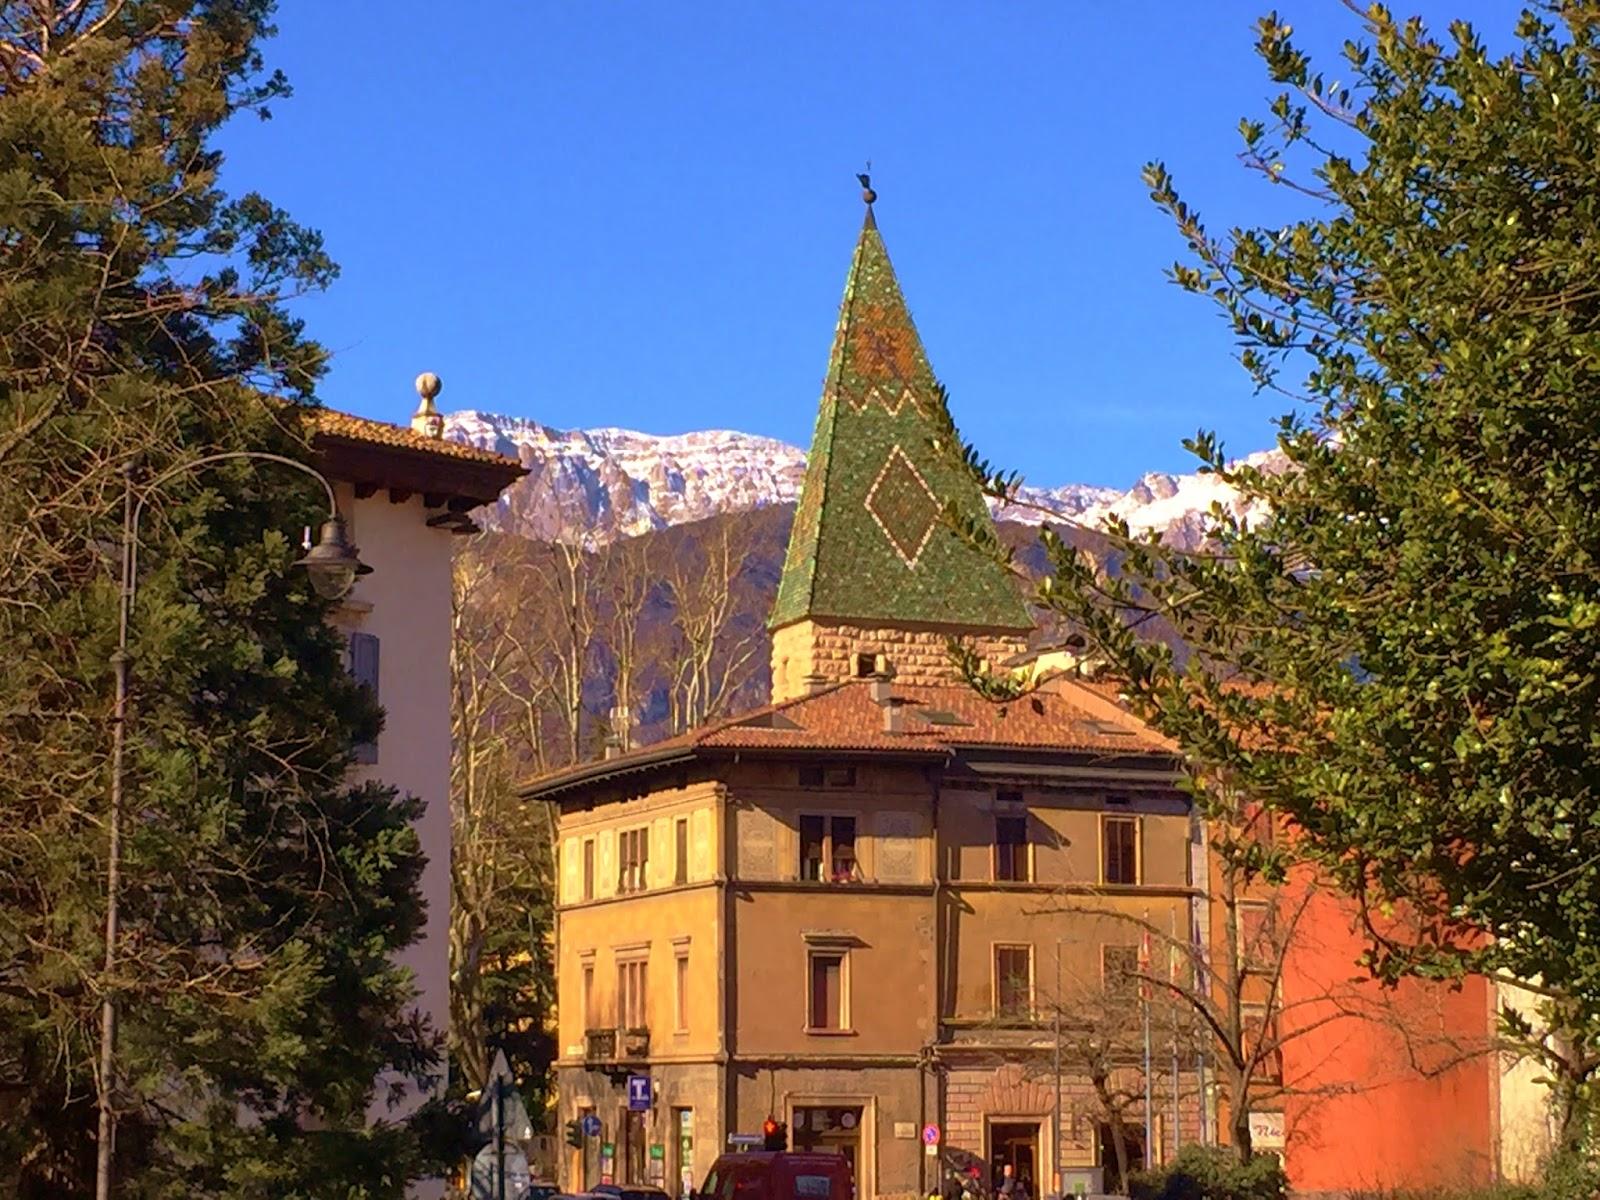 Trento in Trentino, Italy